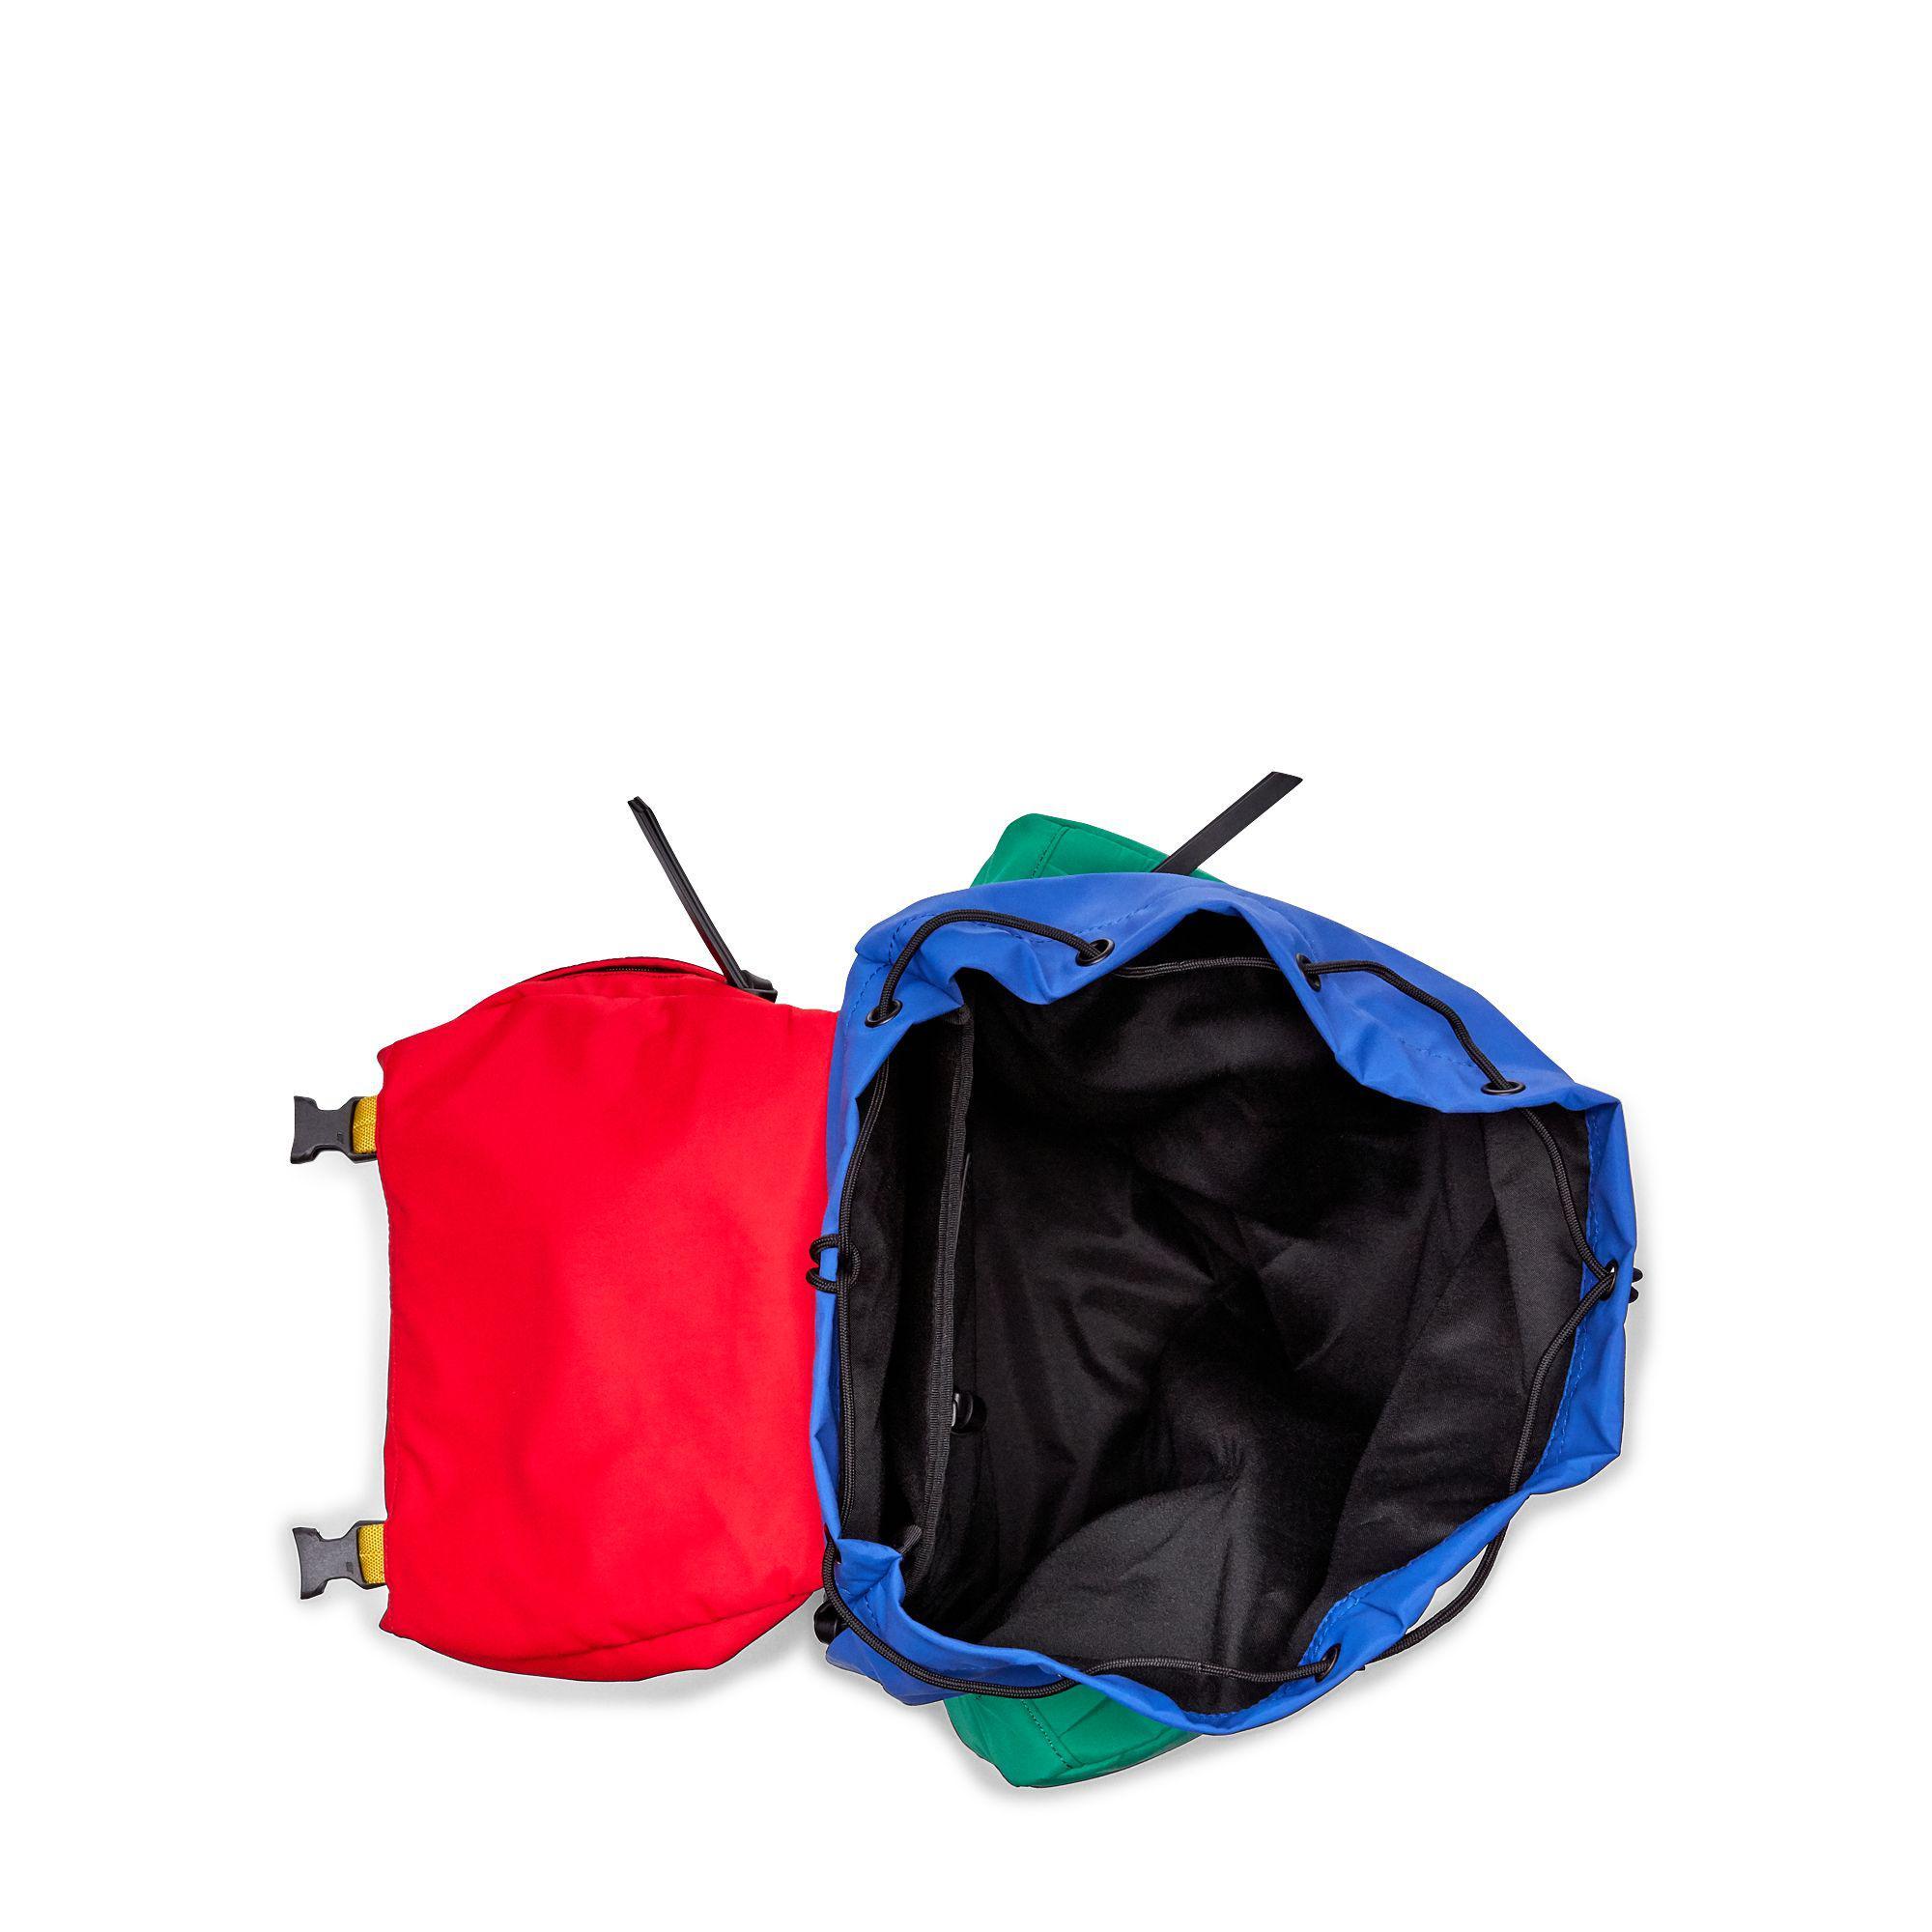 18d2bf03ba7f Lyst - Polo Ralph Lauren Hi Tech Backpack in Blue for Men